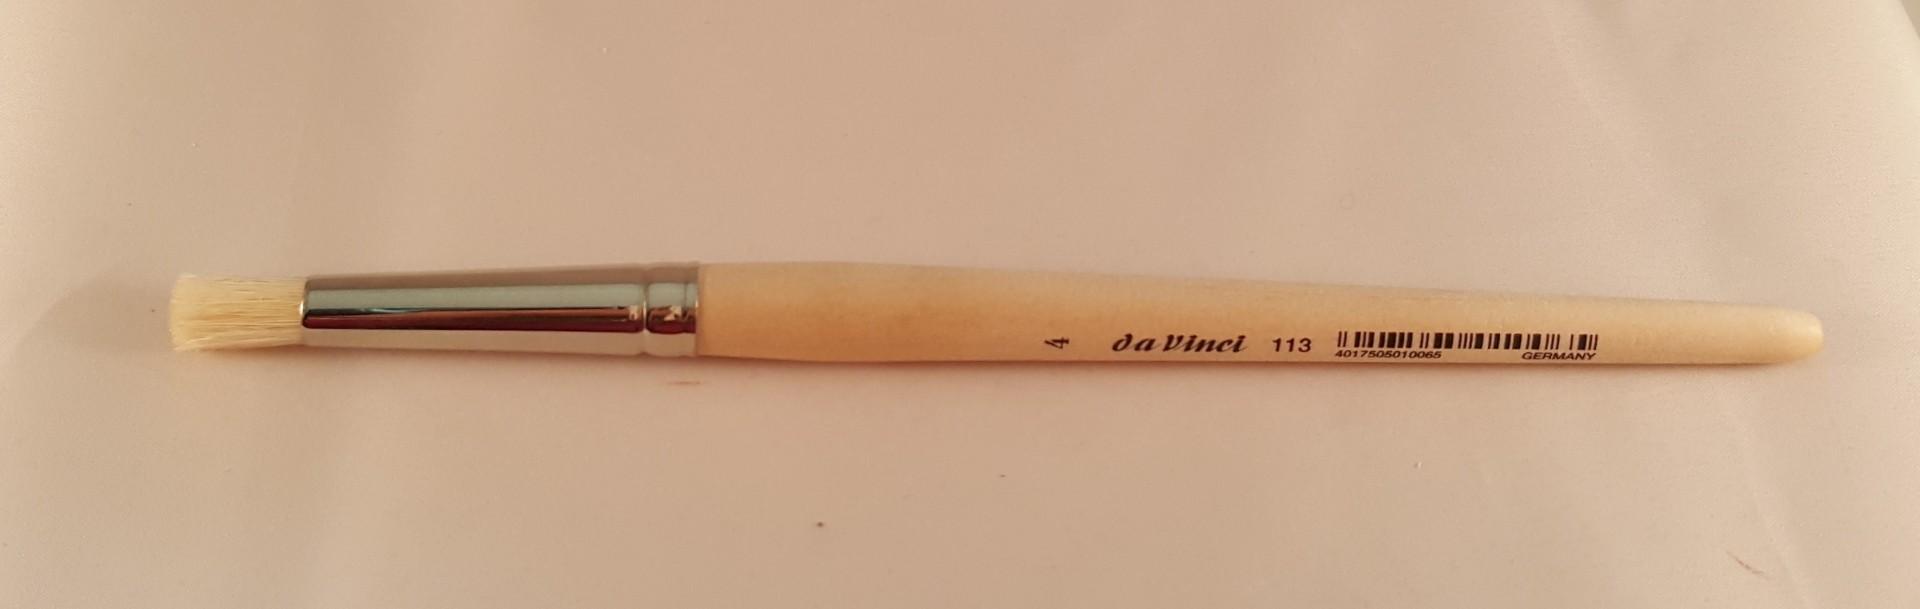 Pincel de stencil da Vinci nº 4